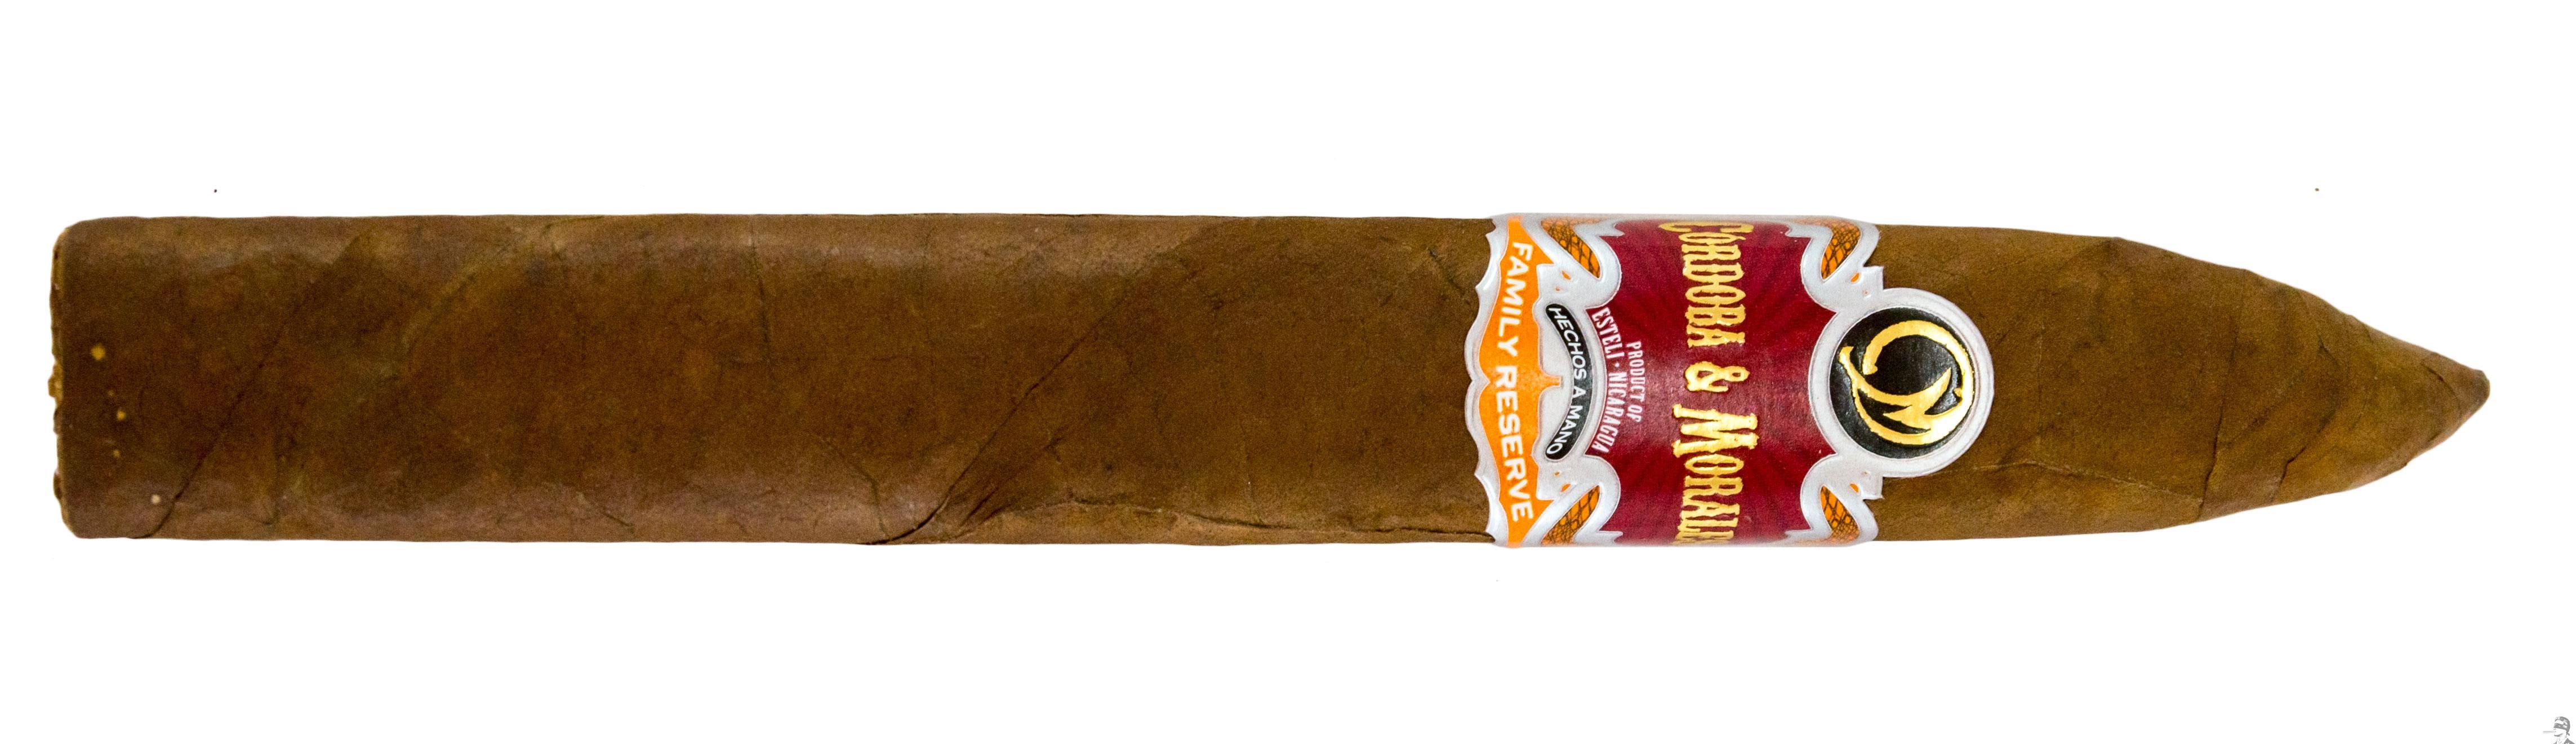 Blind Cigar Review: Cordoba & Morales | Family Reserve Torpedo